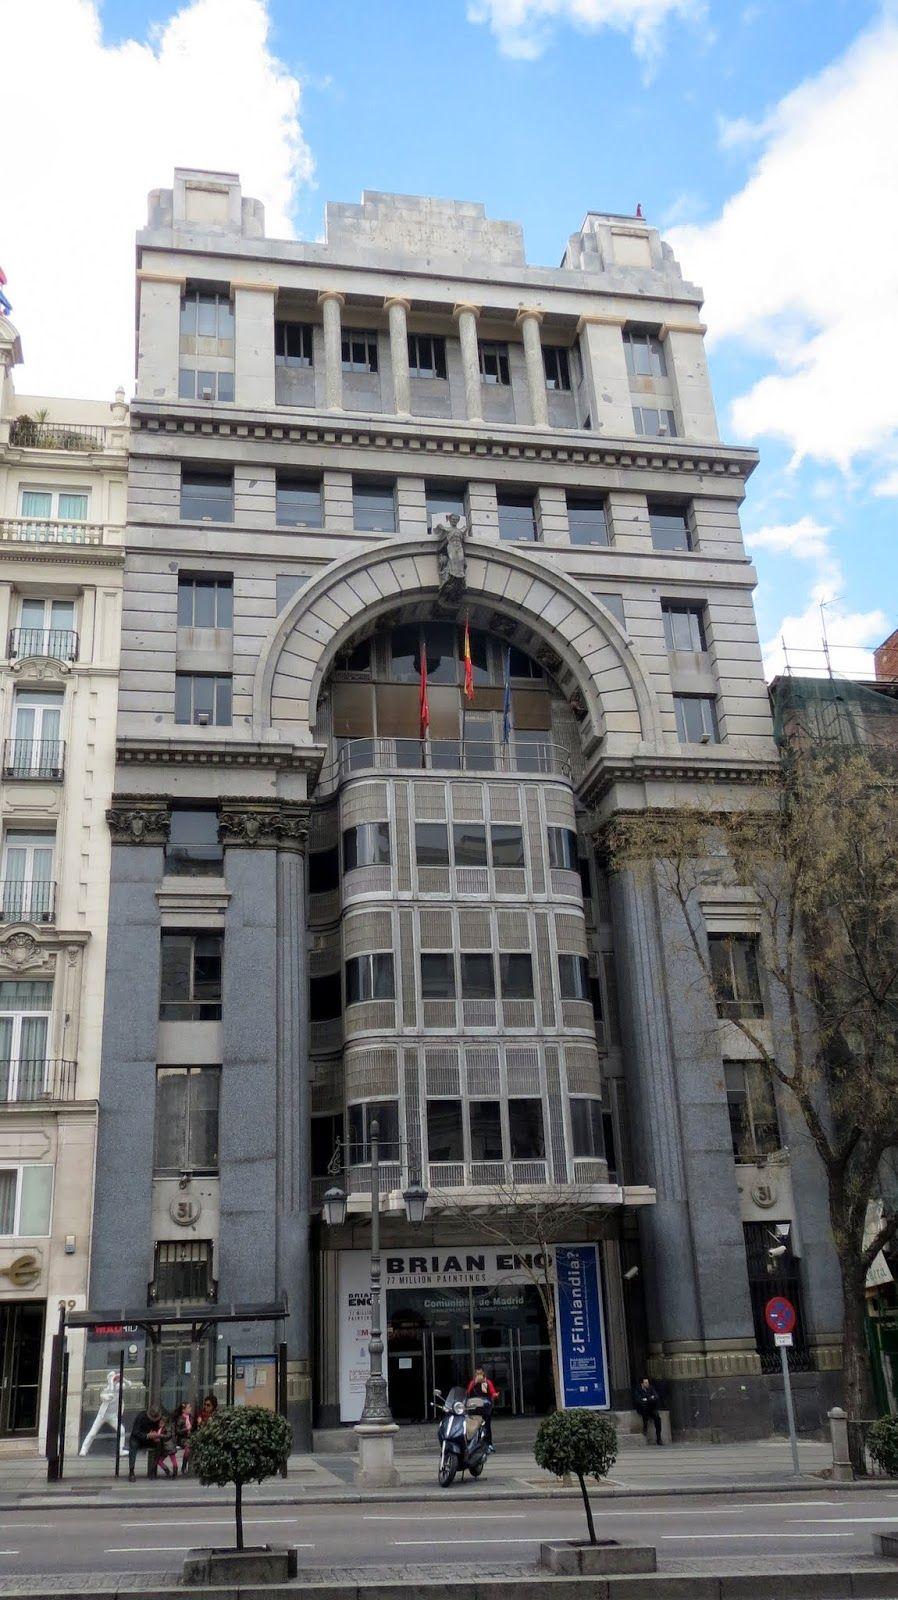 Antonio Palacios Banco Mercantil E Industrial Hoy Sede De